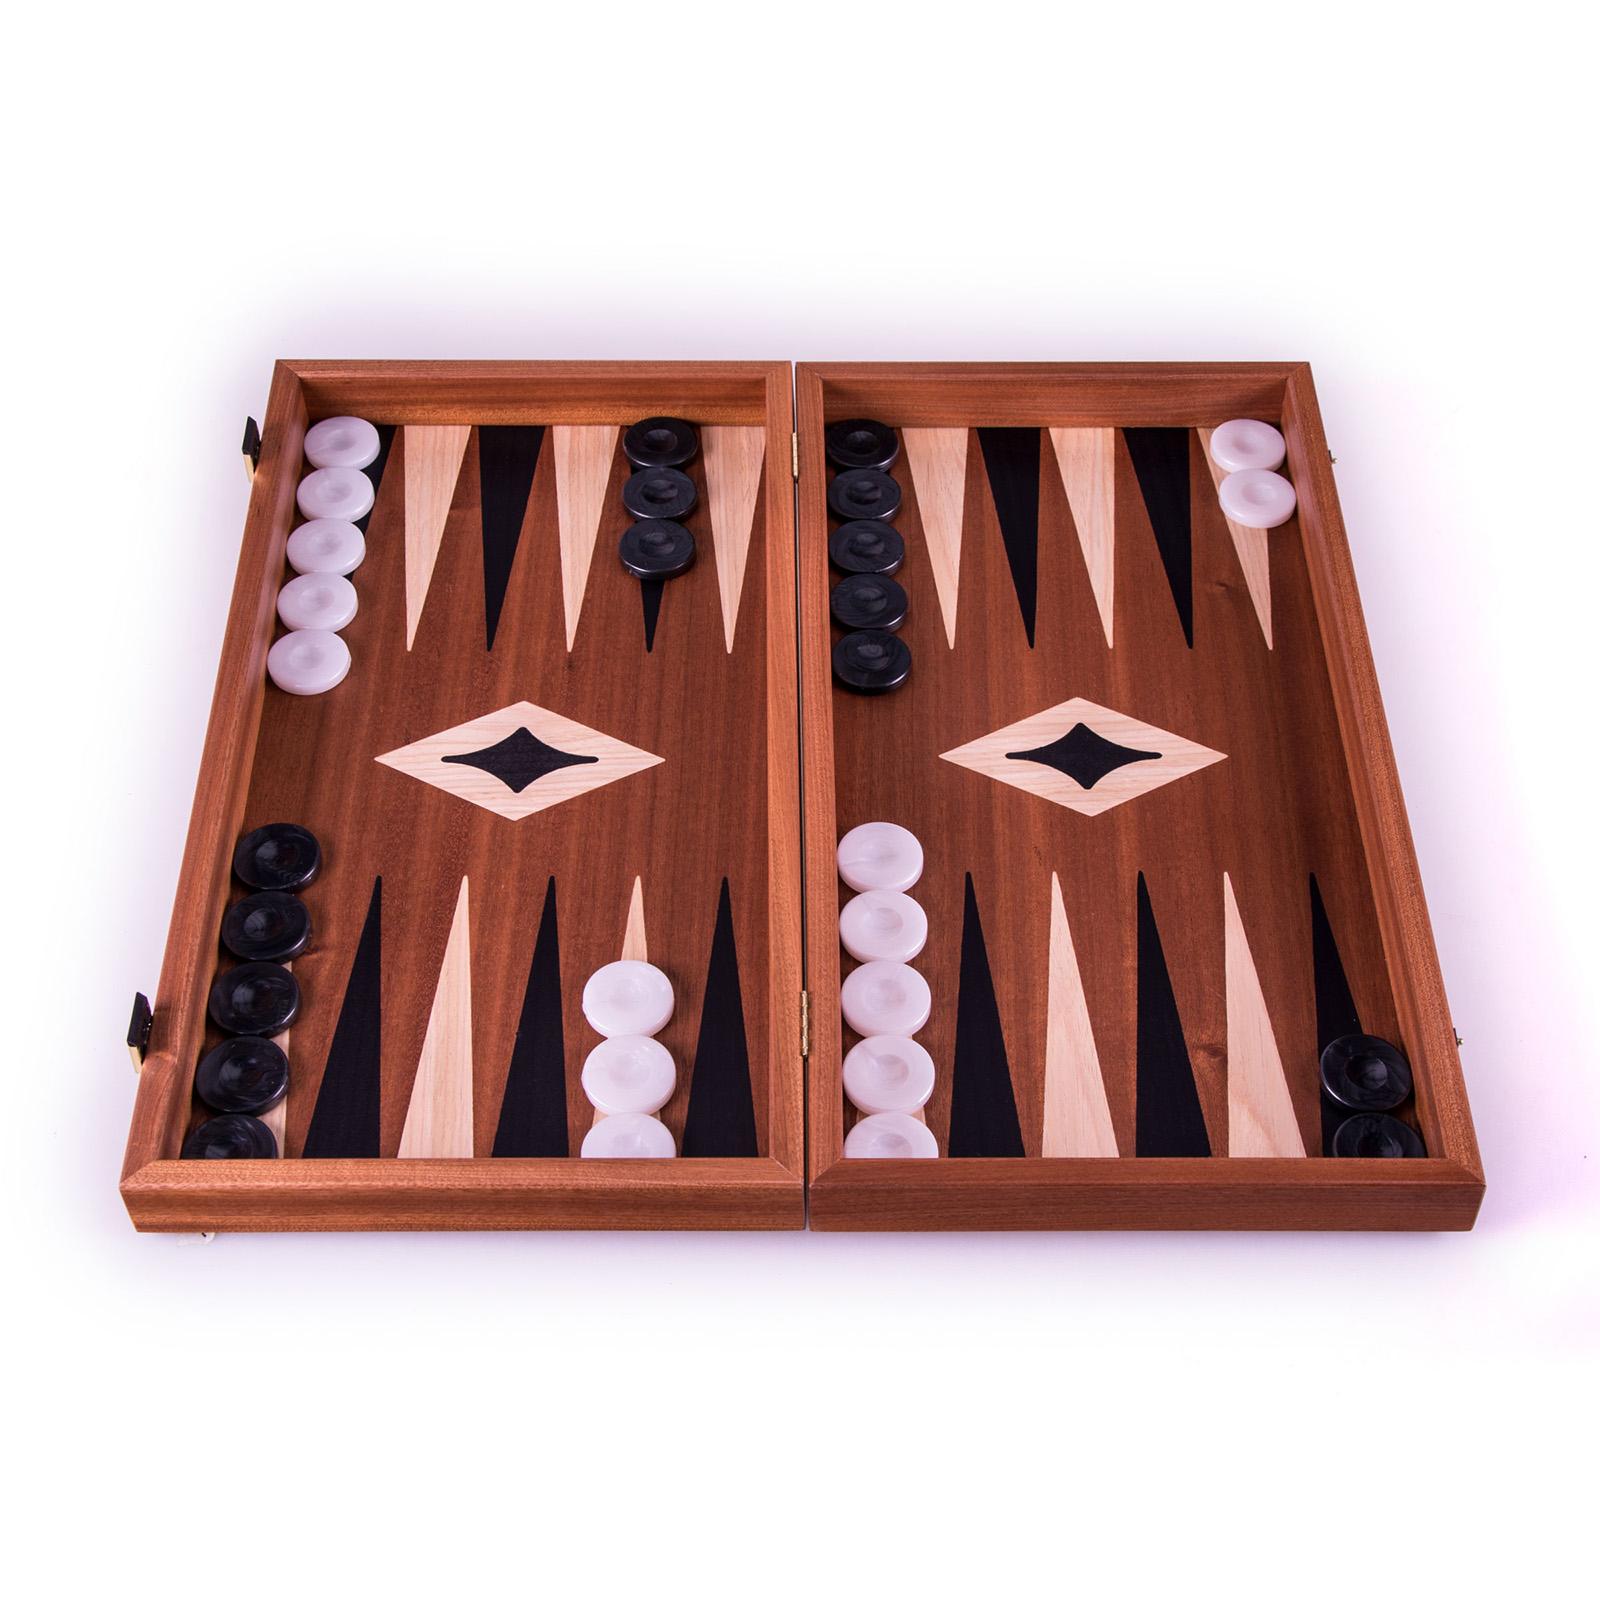 Backgammon-Set aus Mahagoni aus Griechenland, handgefertigt 30x17 cm